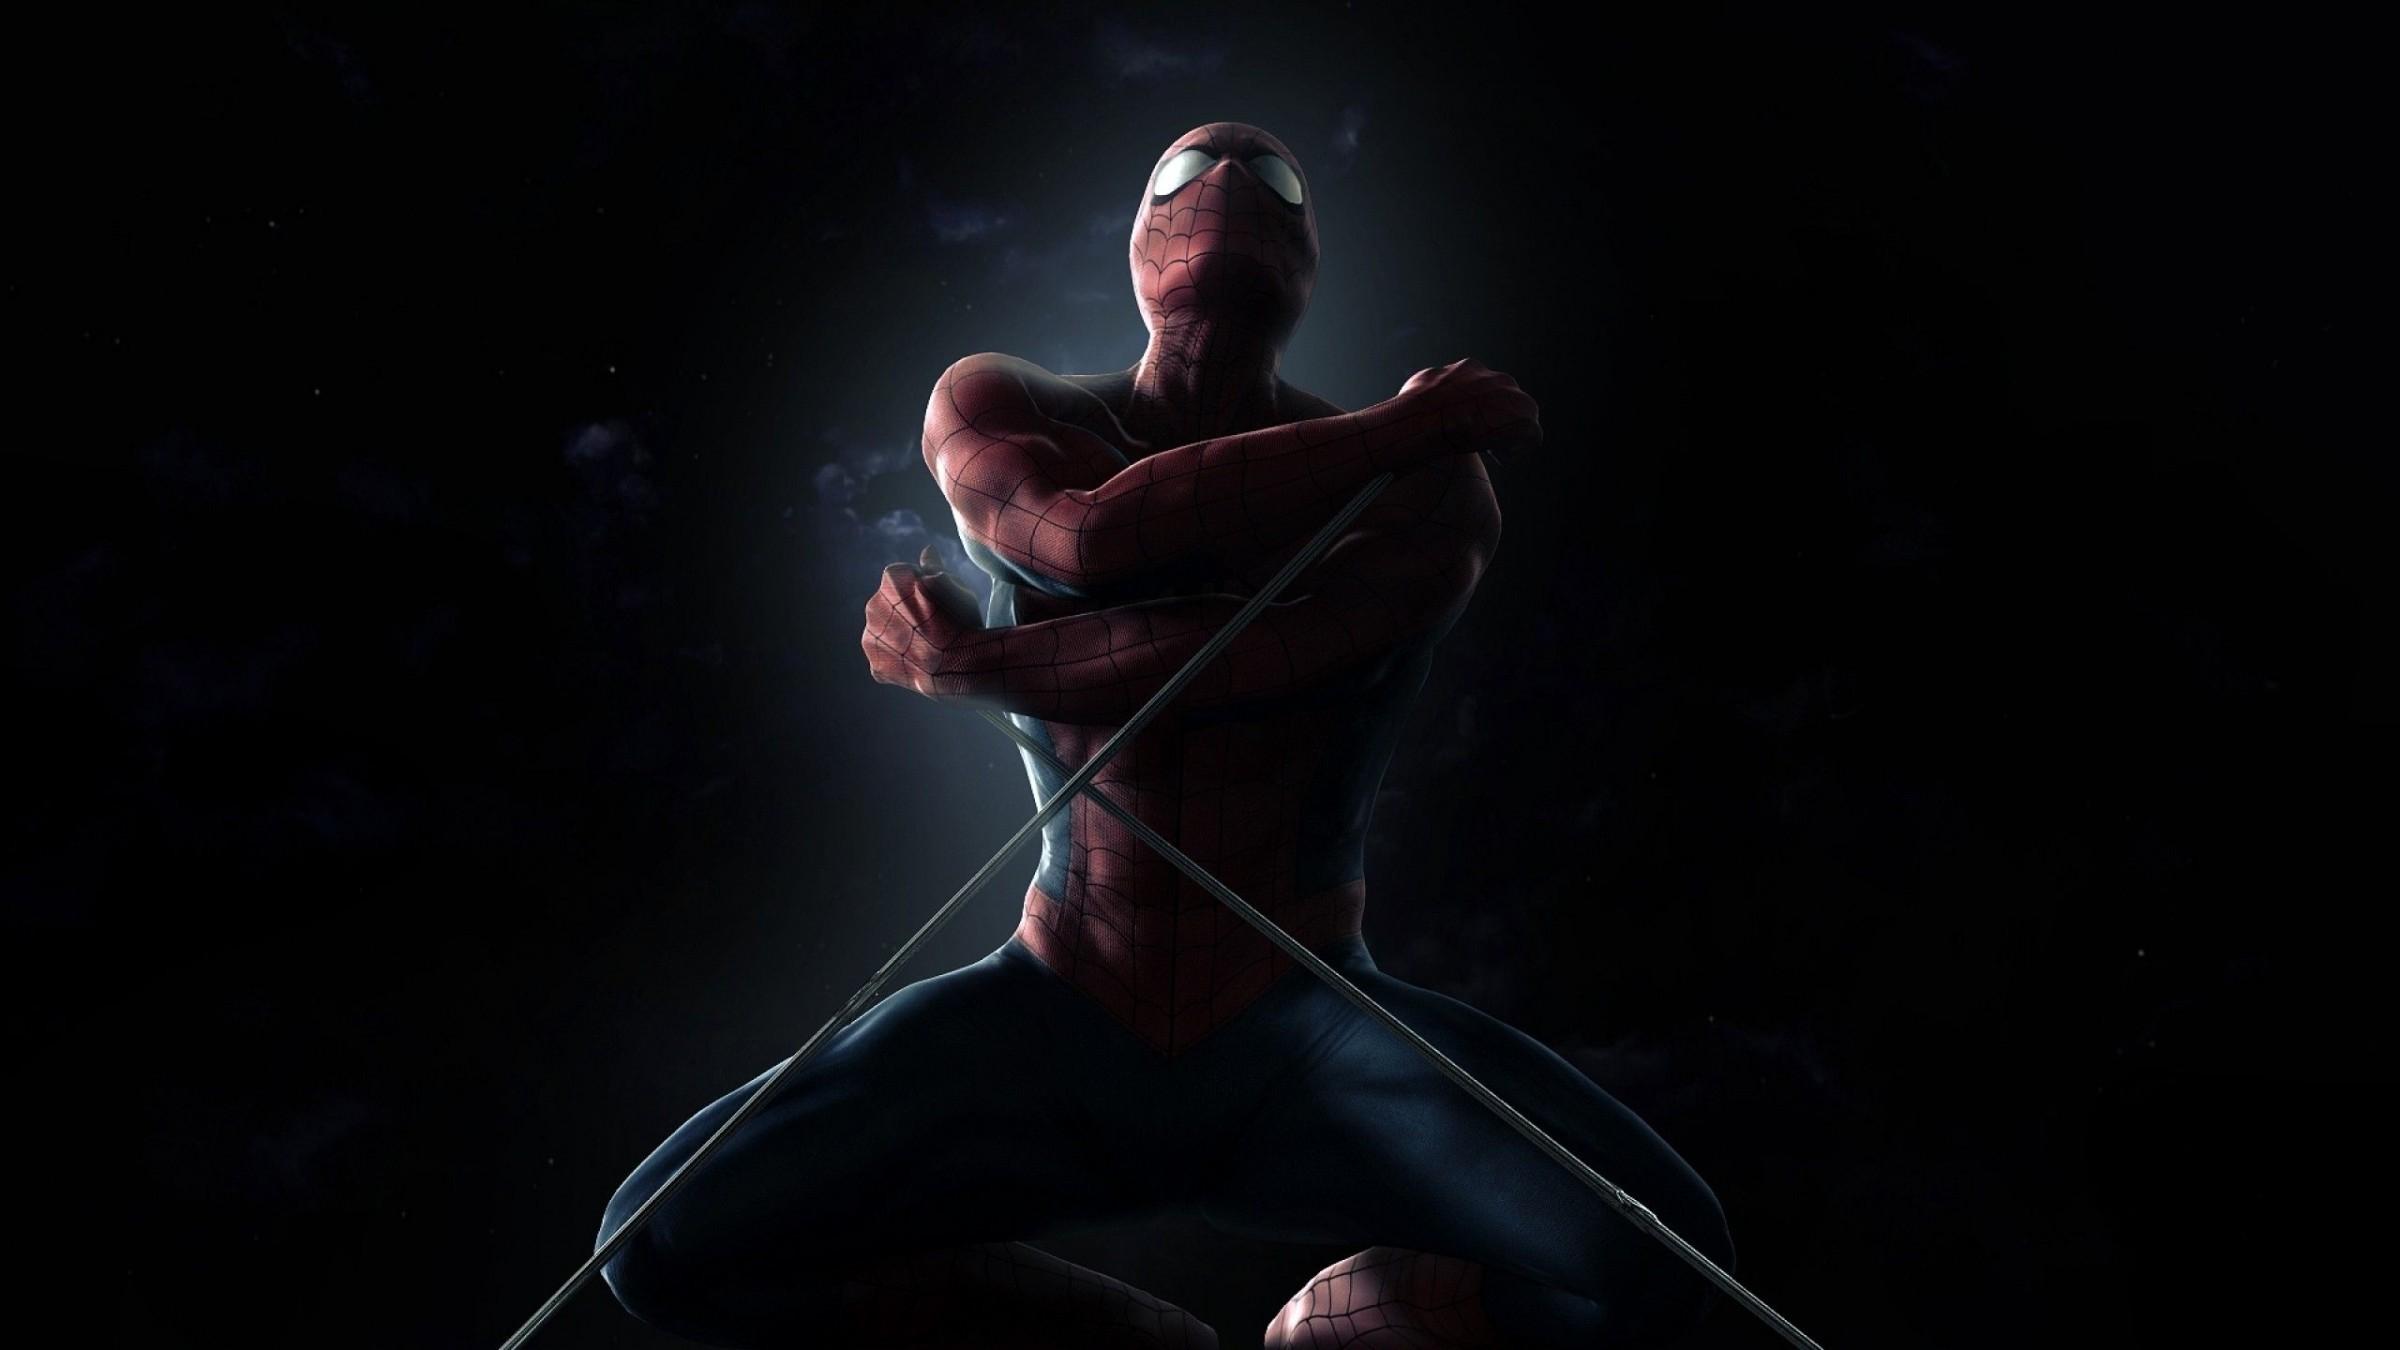 free wallpicz: Spiderman Hd Desktop Wallpaper Wallpapers Of Spiderman 4  Wallpapers)